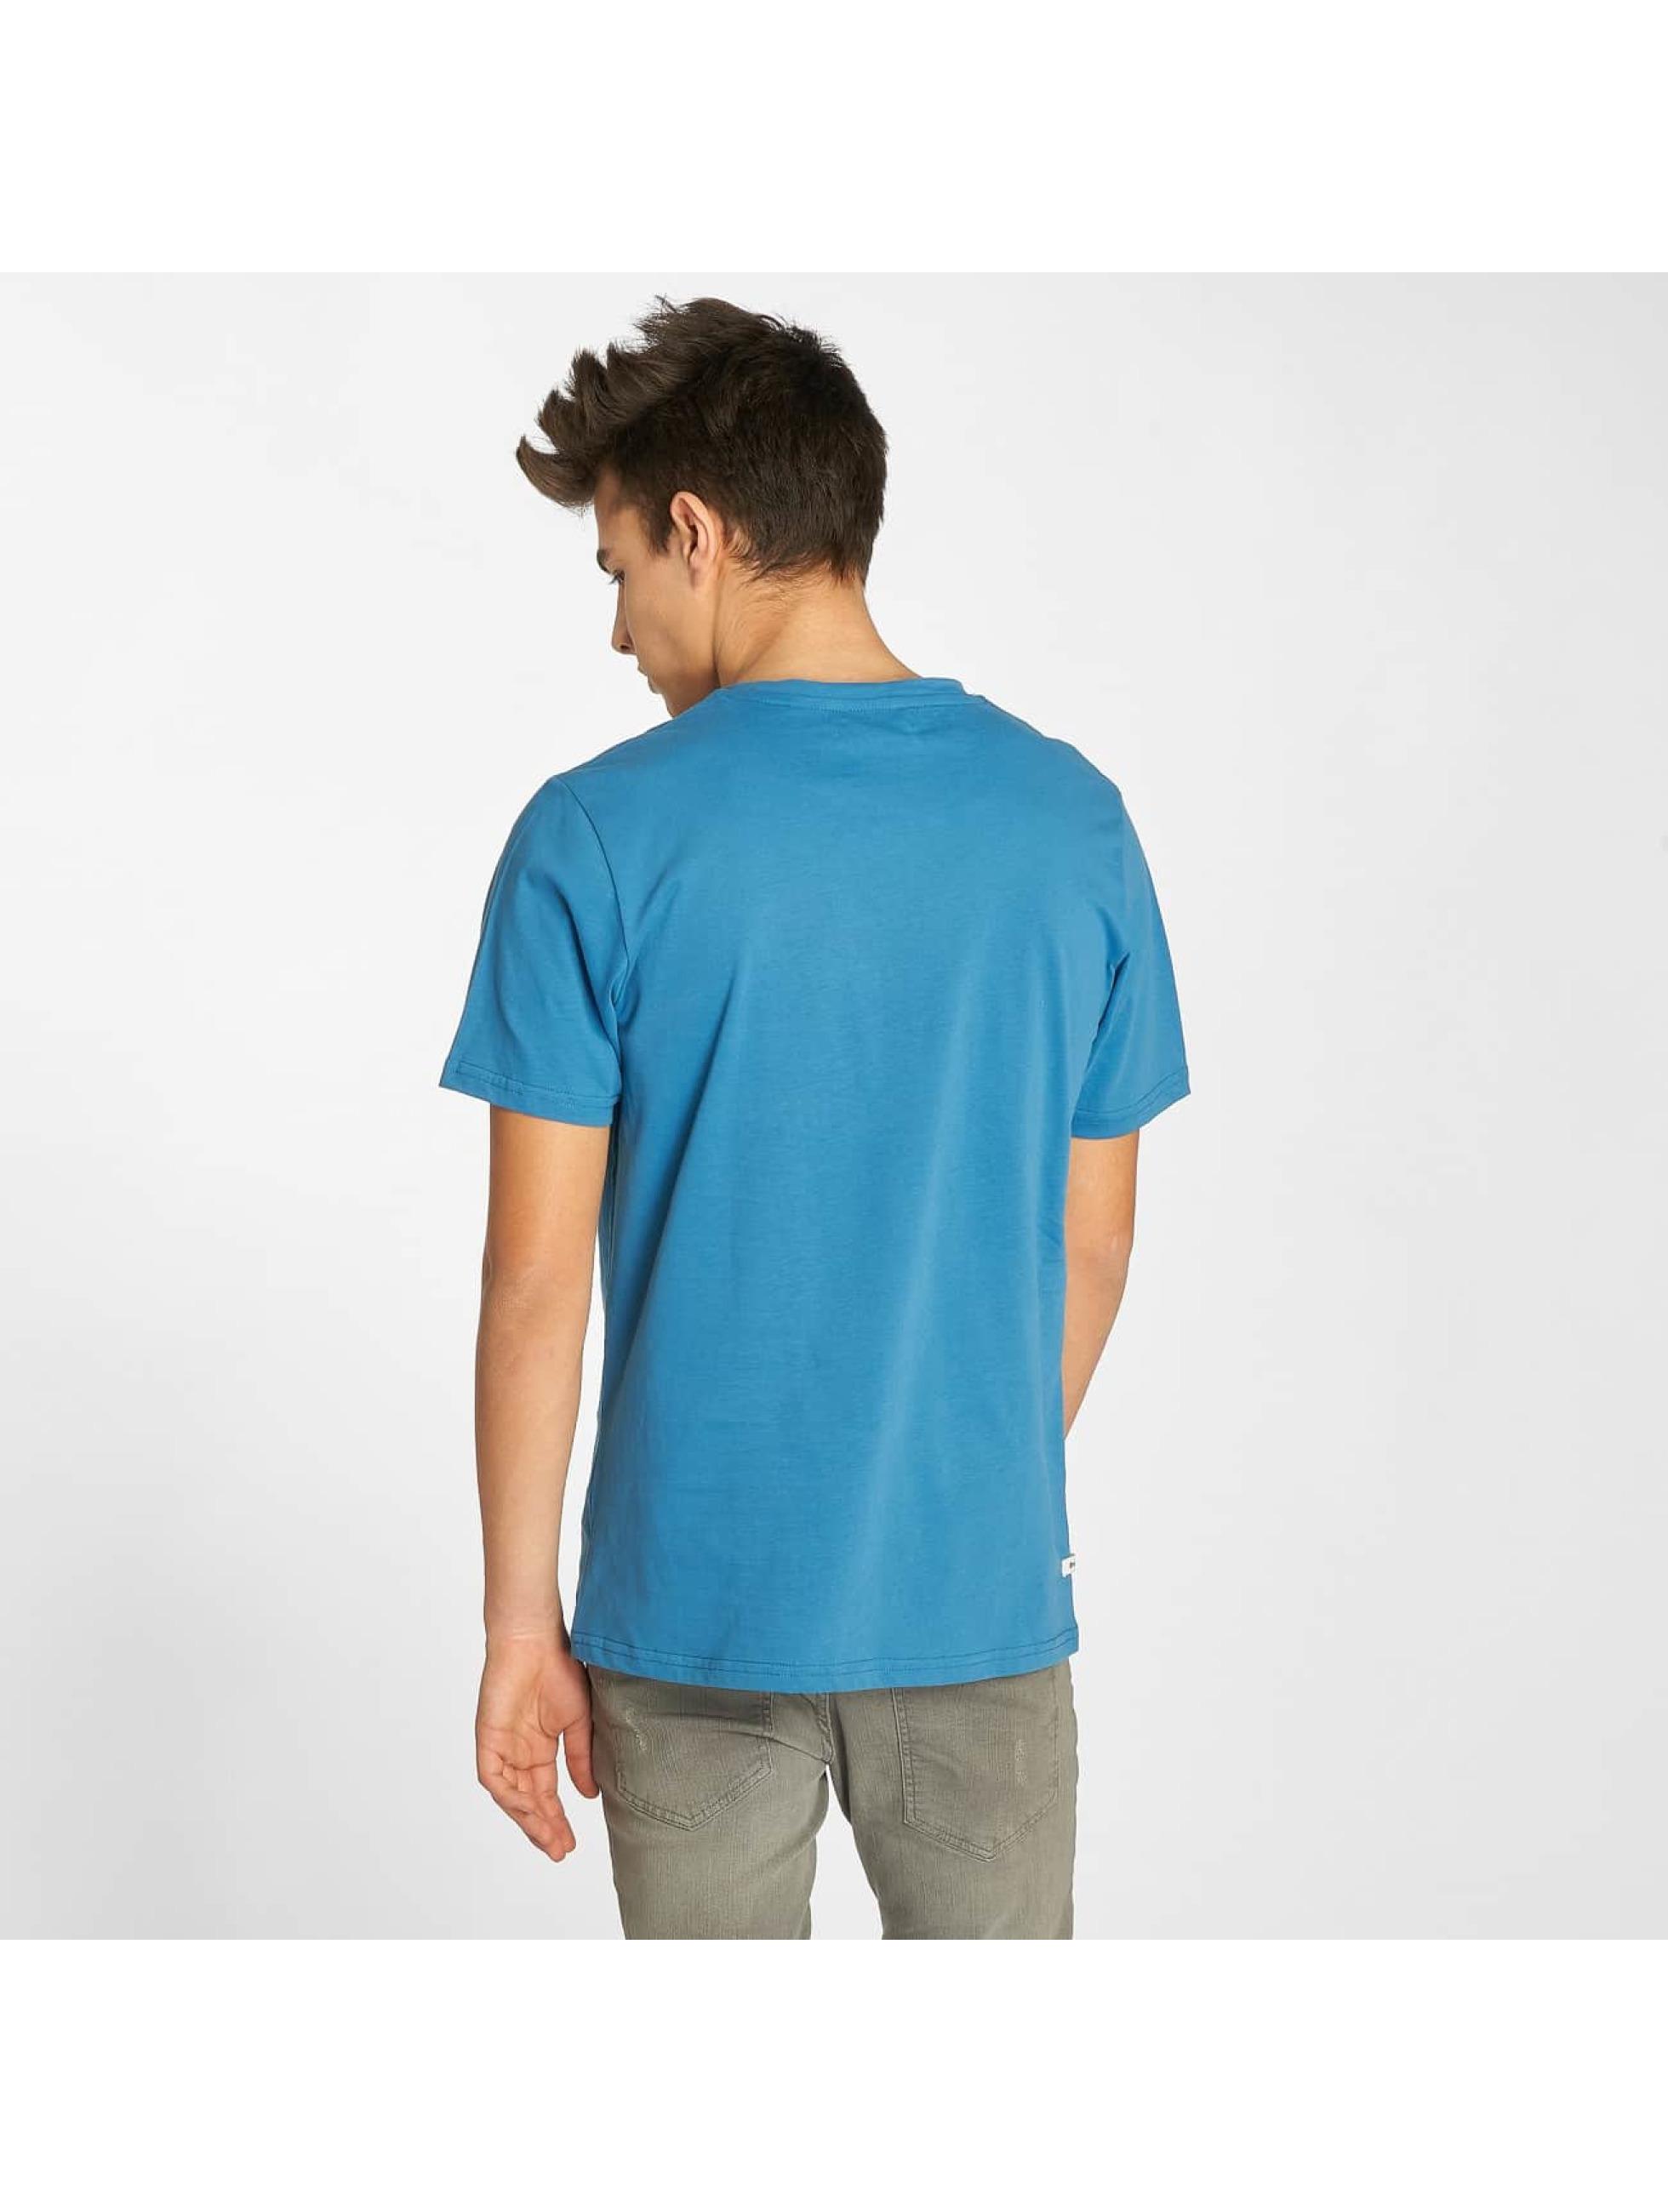 Kulte Tričká Corpo College modrá